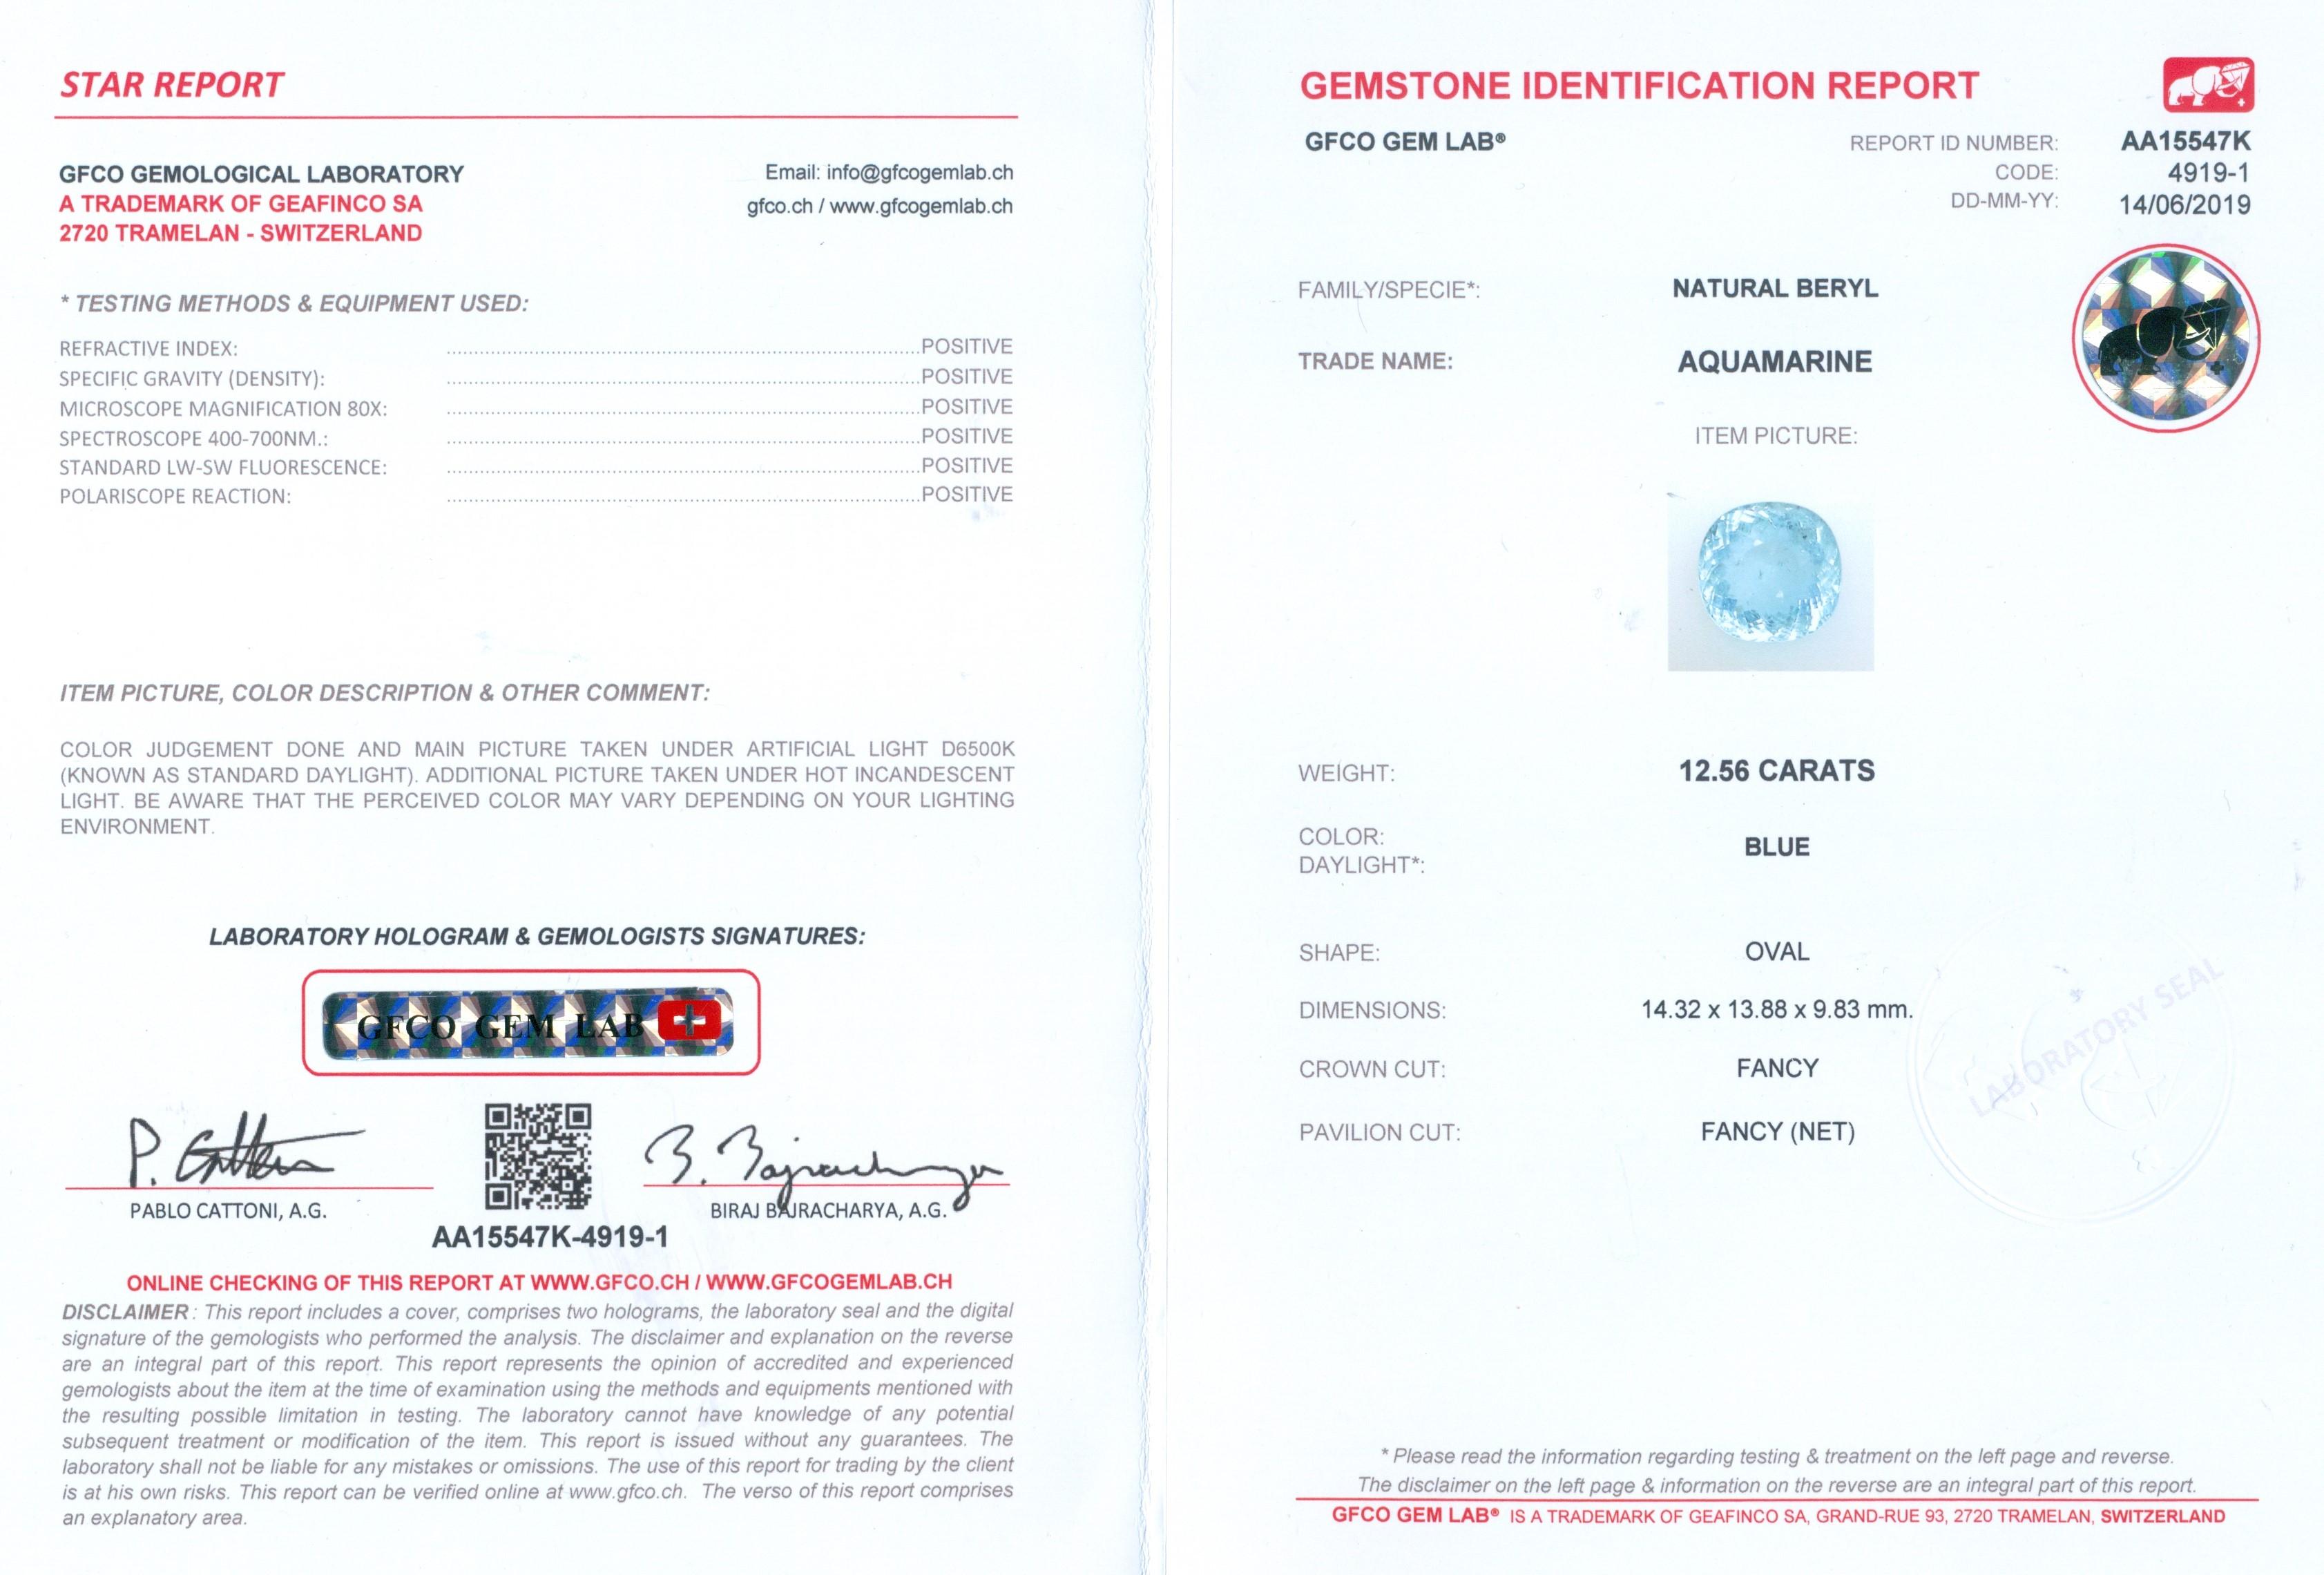 Lot 57 - GFCO (SWISS) Certified 12.56 ct. Blue Aquamarine - BRAZIL